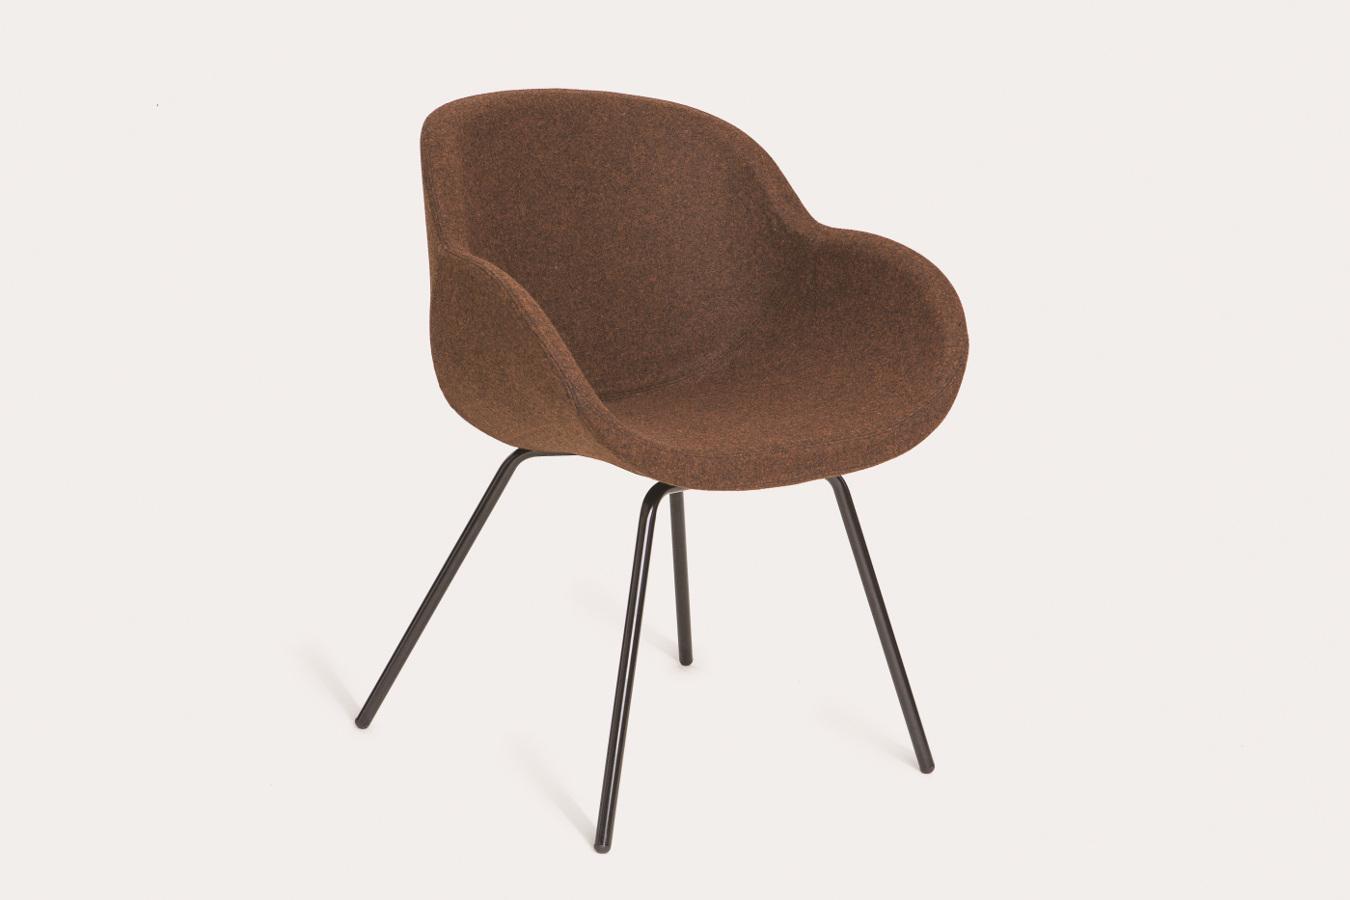 lup-kleiner-Sessel-real-piel